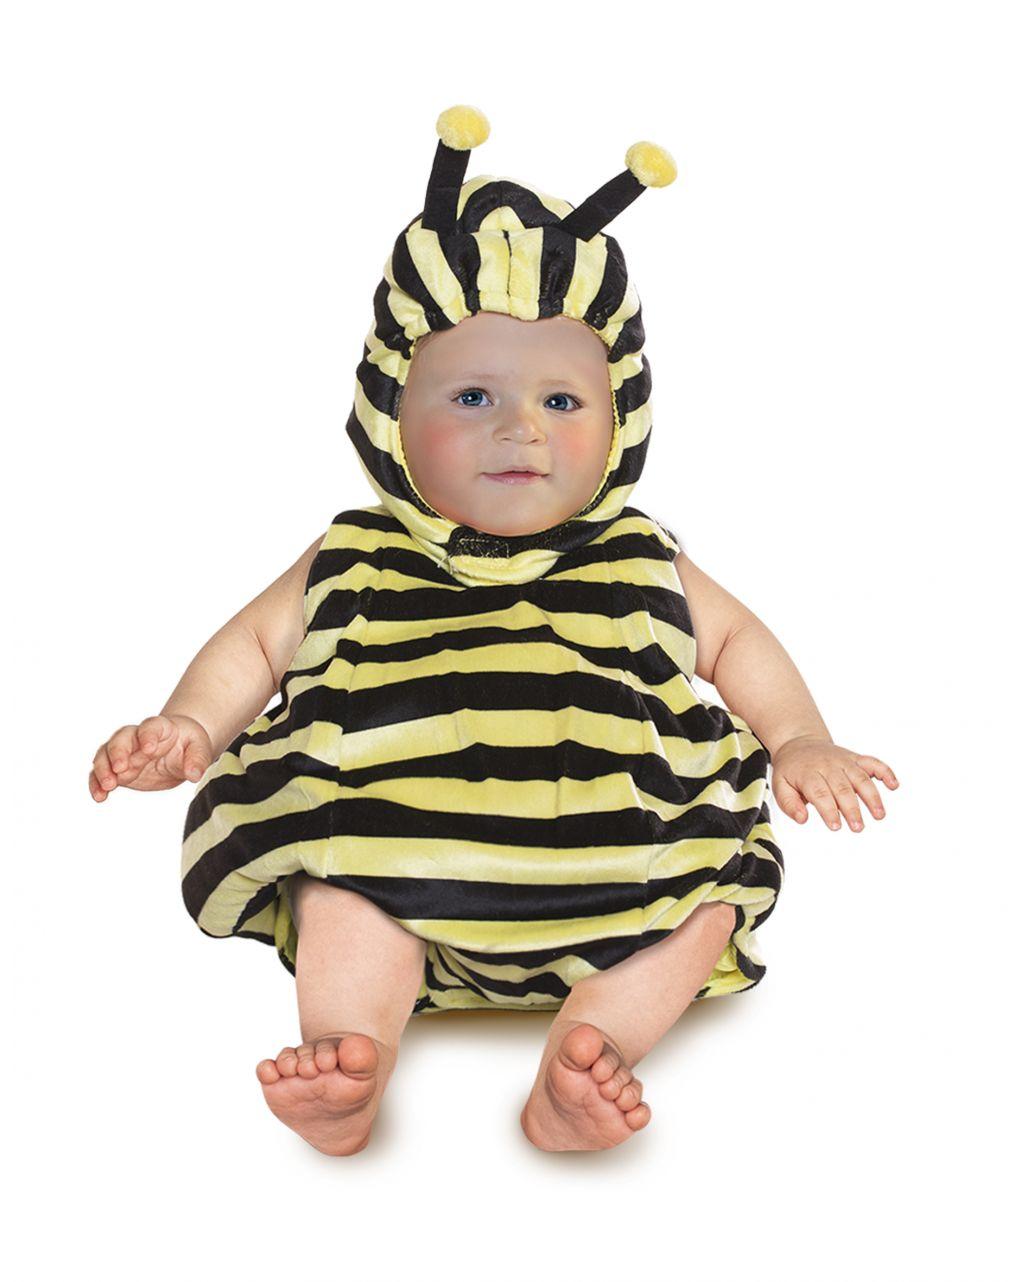 Costume apina baby 12 mesi - Carnaval Queen